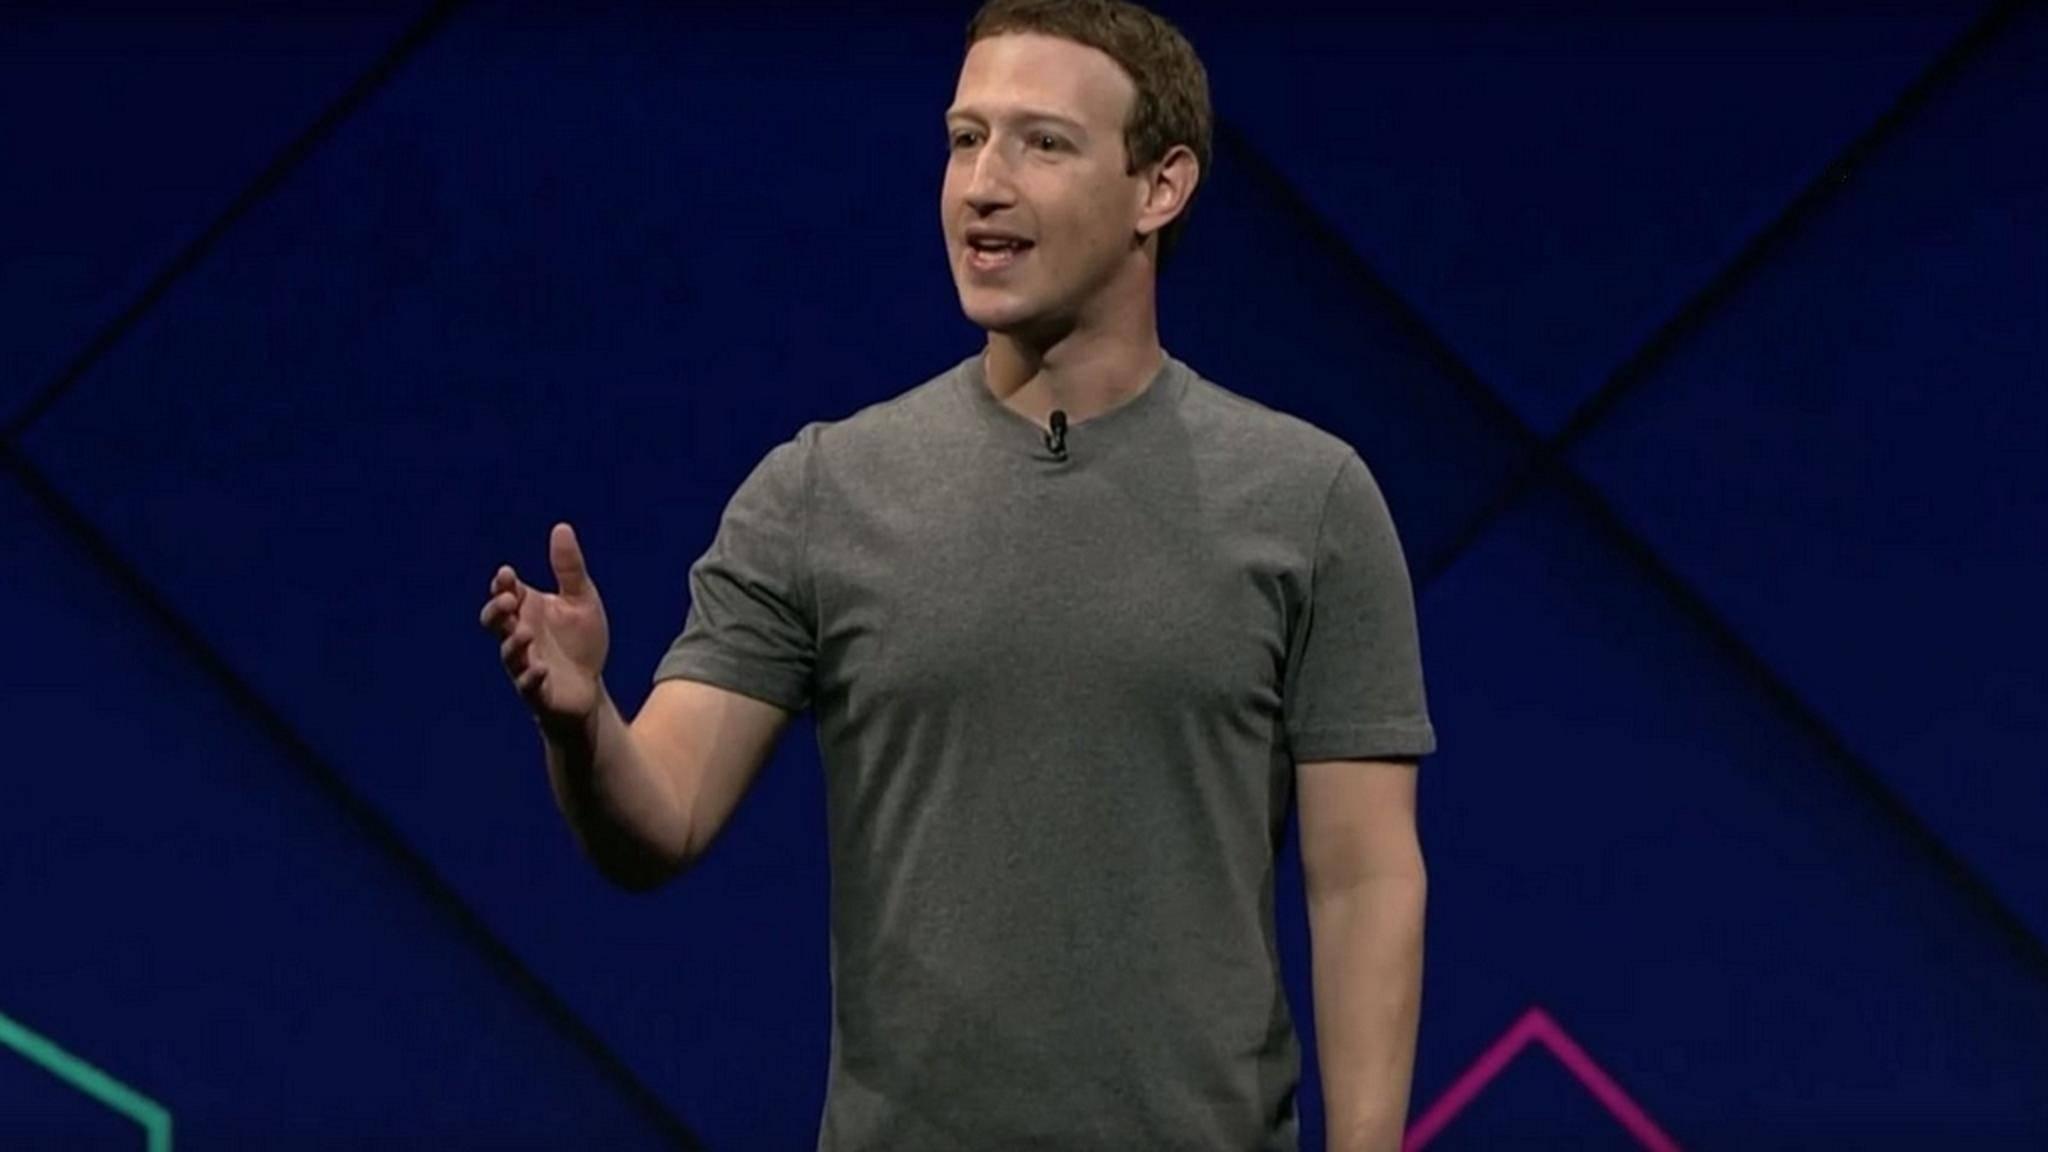 Nun muss sich Mark Zuckerberg mit dem nächsten Datenskandal befassen.